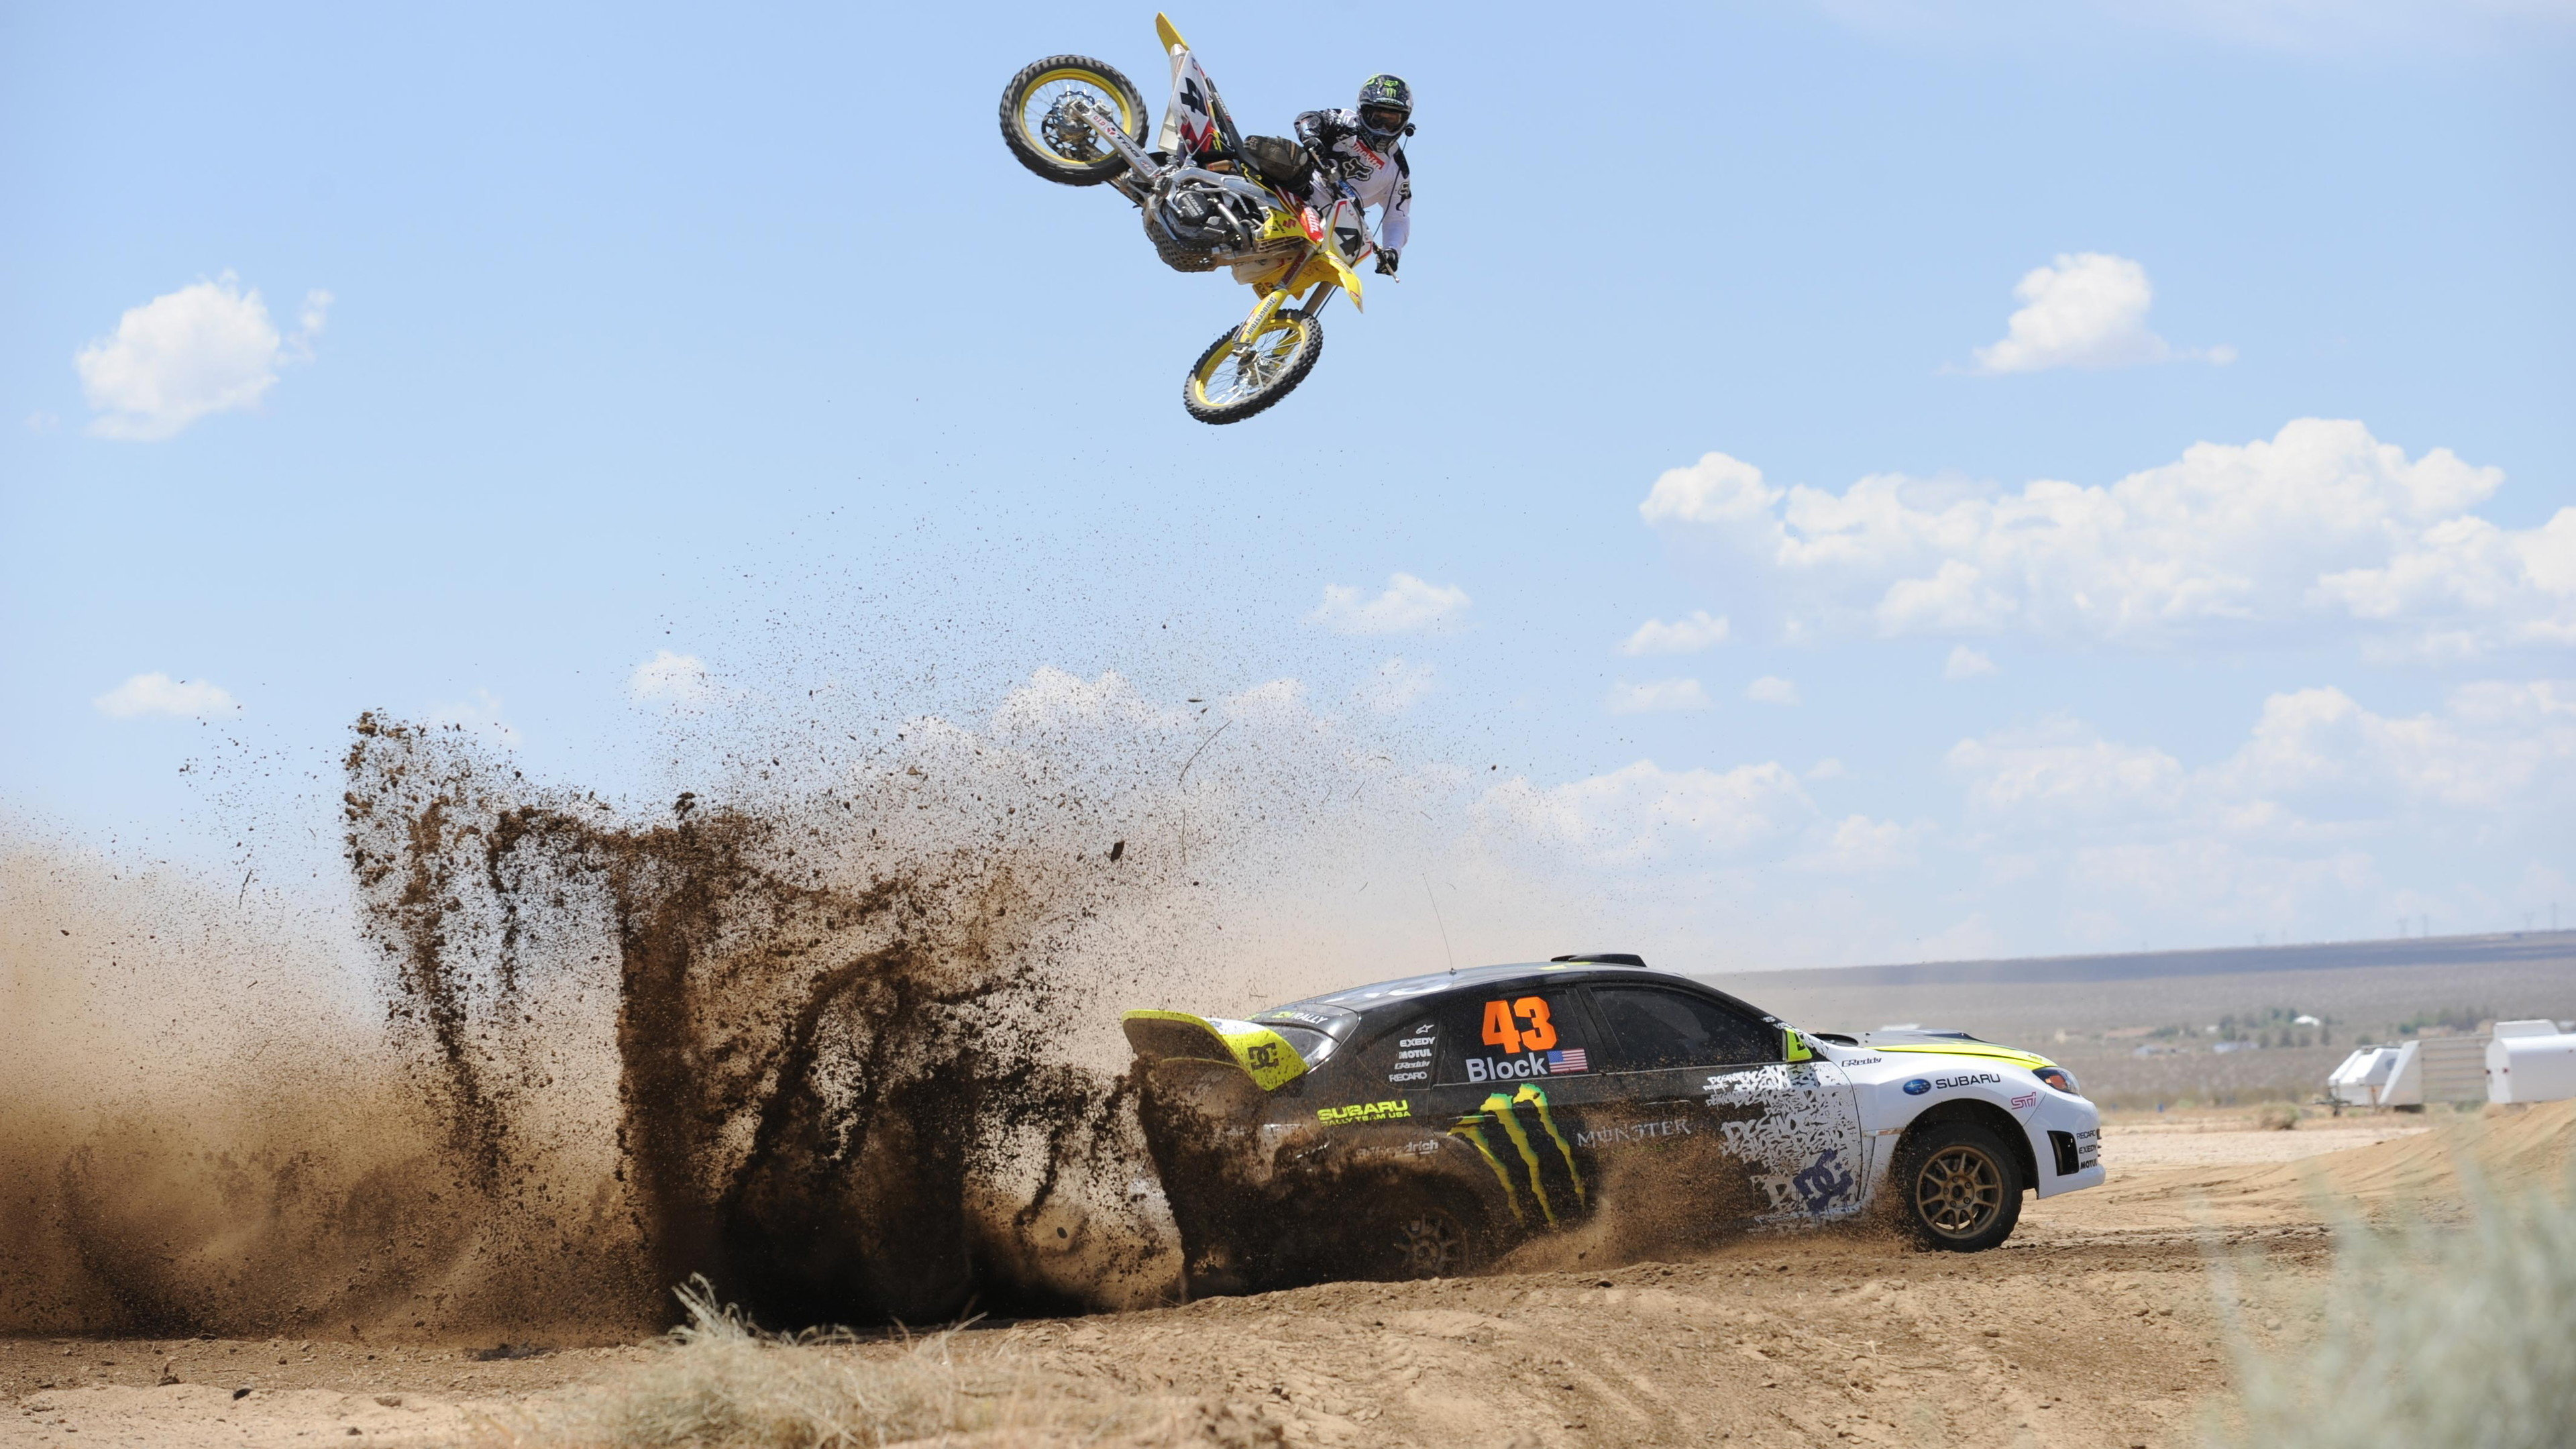 Racing Race Cars Wallpapers 3840x2160 Ultra Hd 4k Desktop Backgrounds